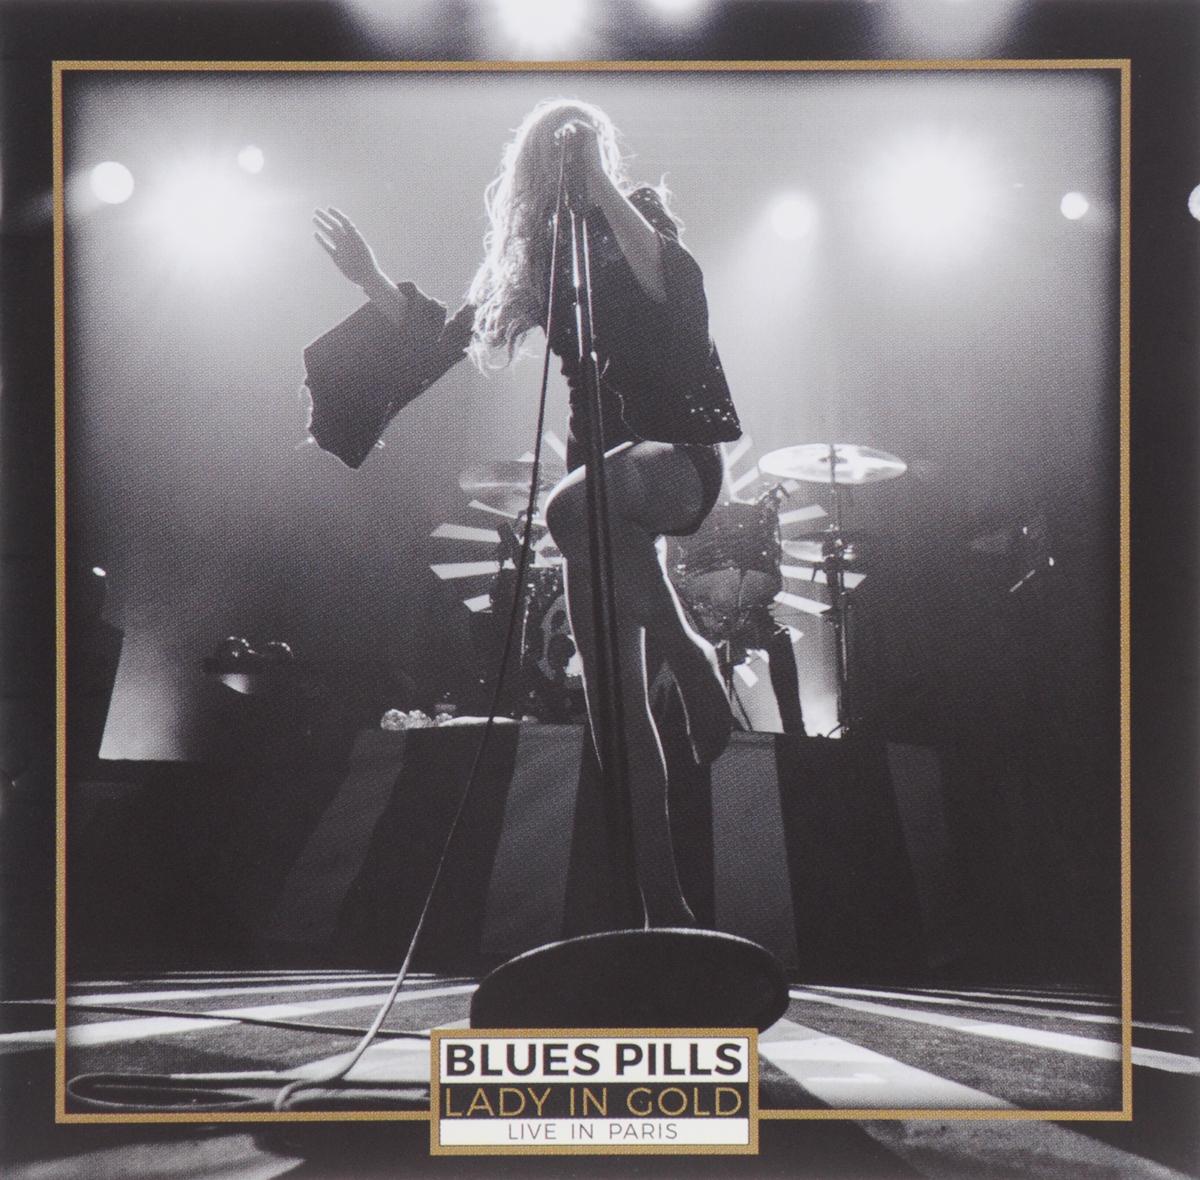 Blues Pills Blues Pills. Lady In Gold - Live in Paris (2 CD) desert blues ambiance du sahara 2 cd